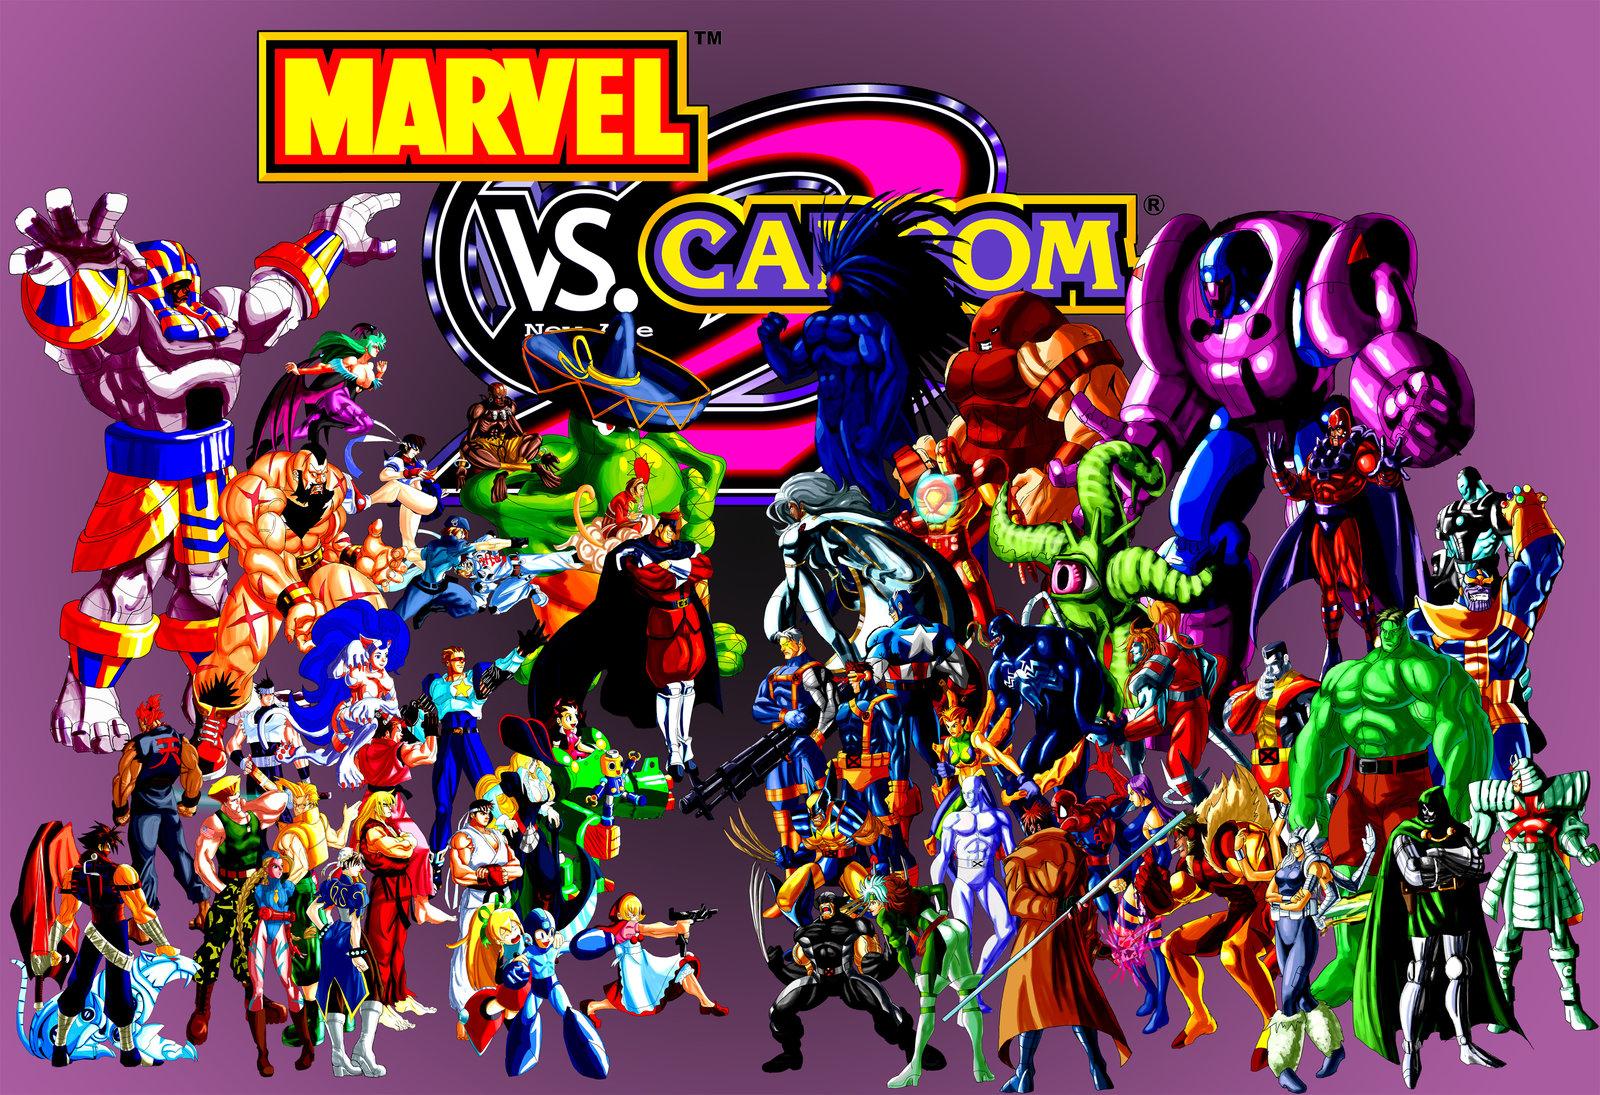 Marvel Vs Capcom 2 Wallpaper